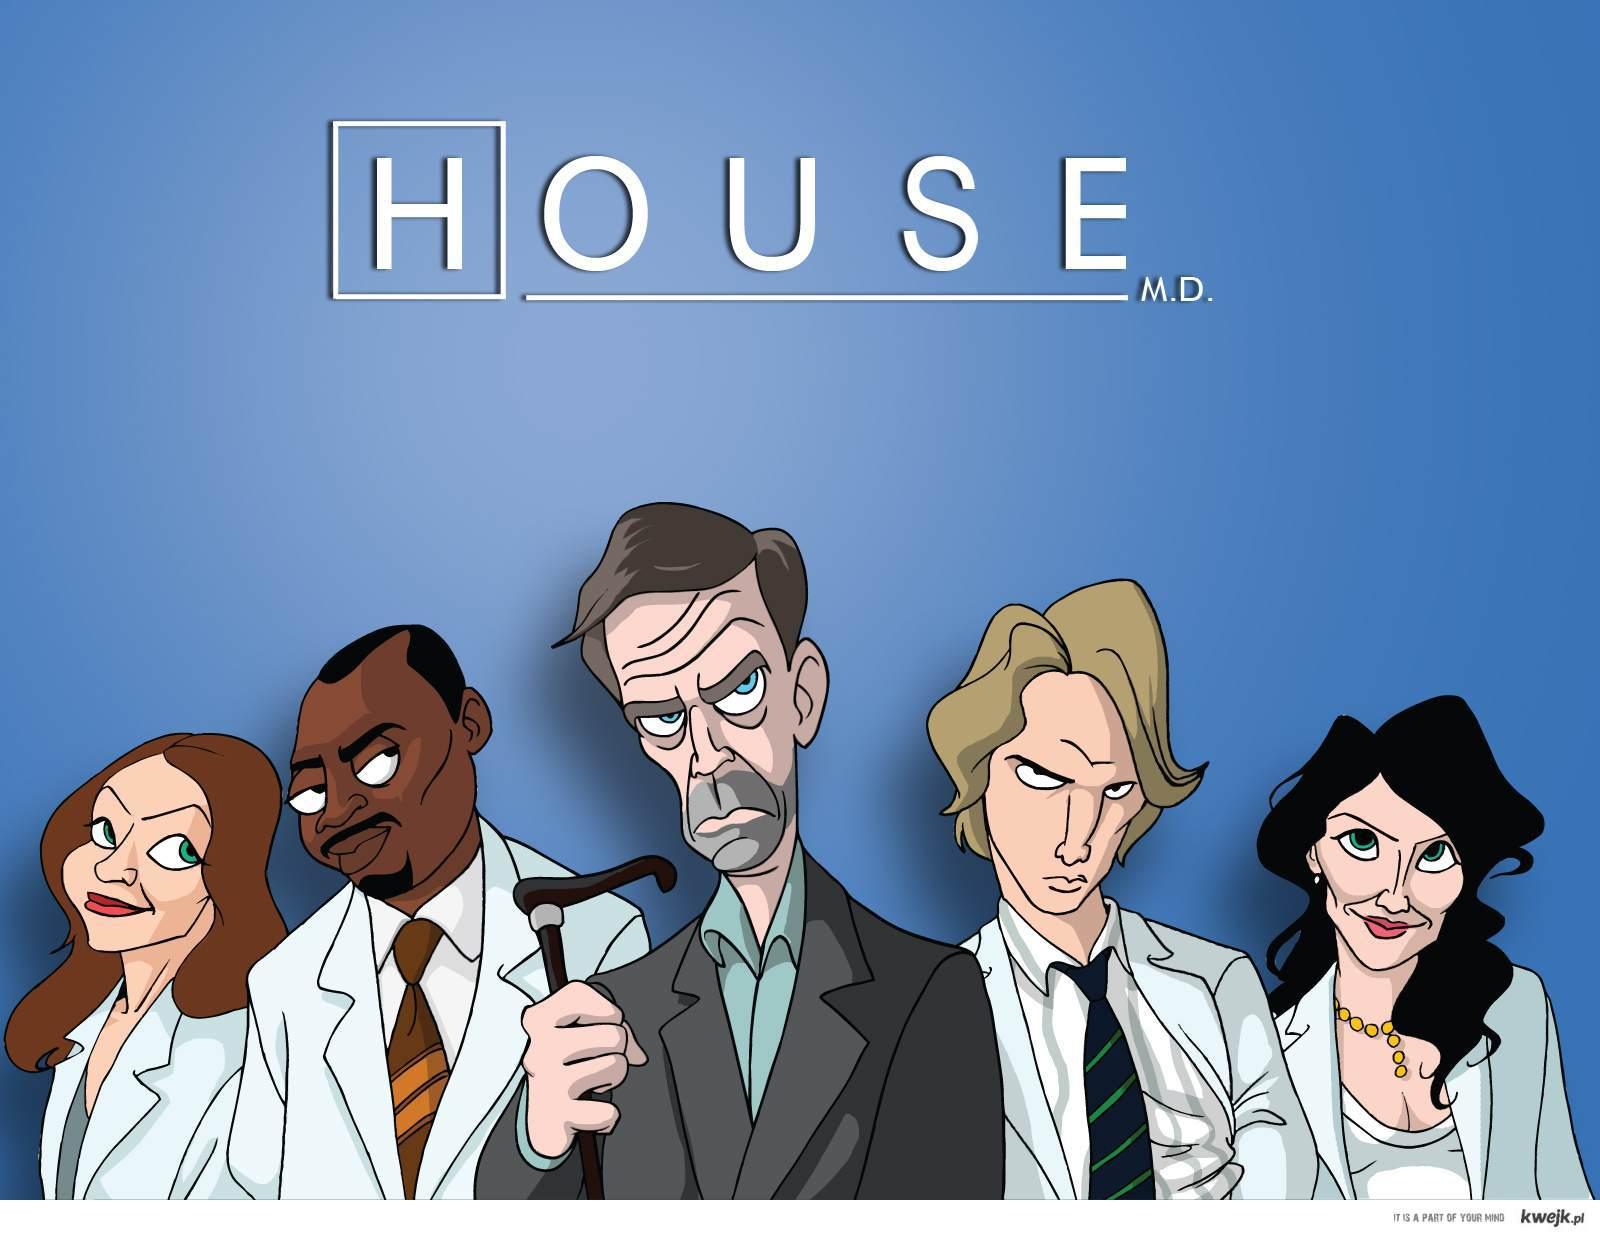 doktor House